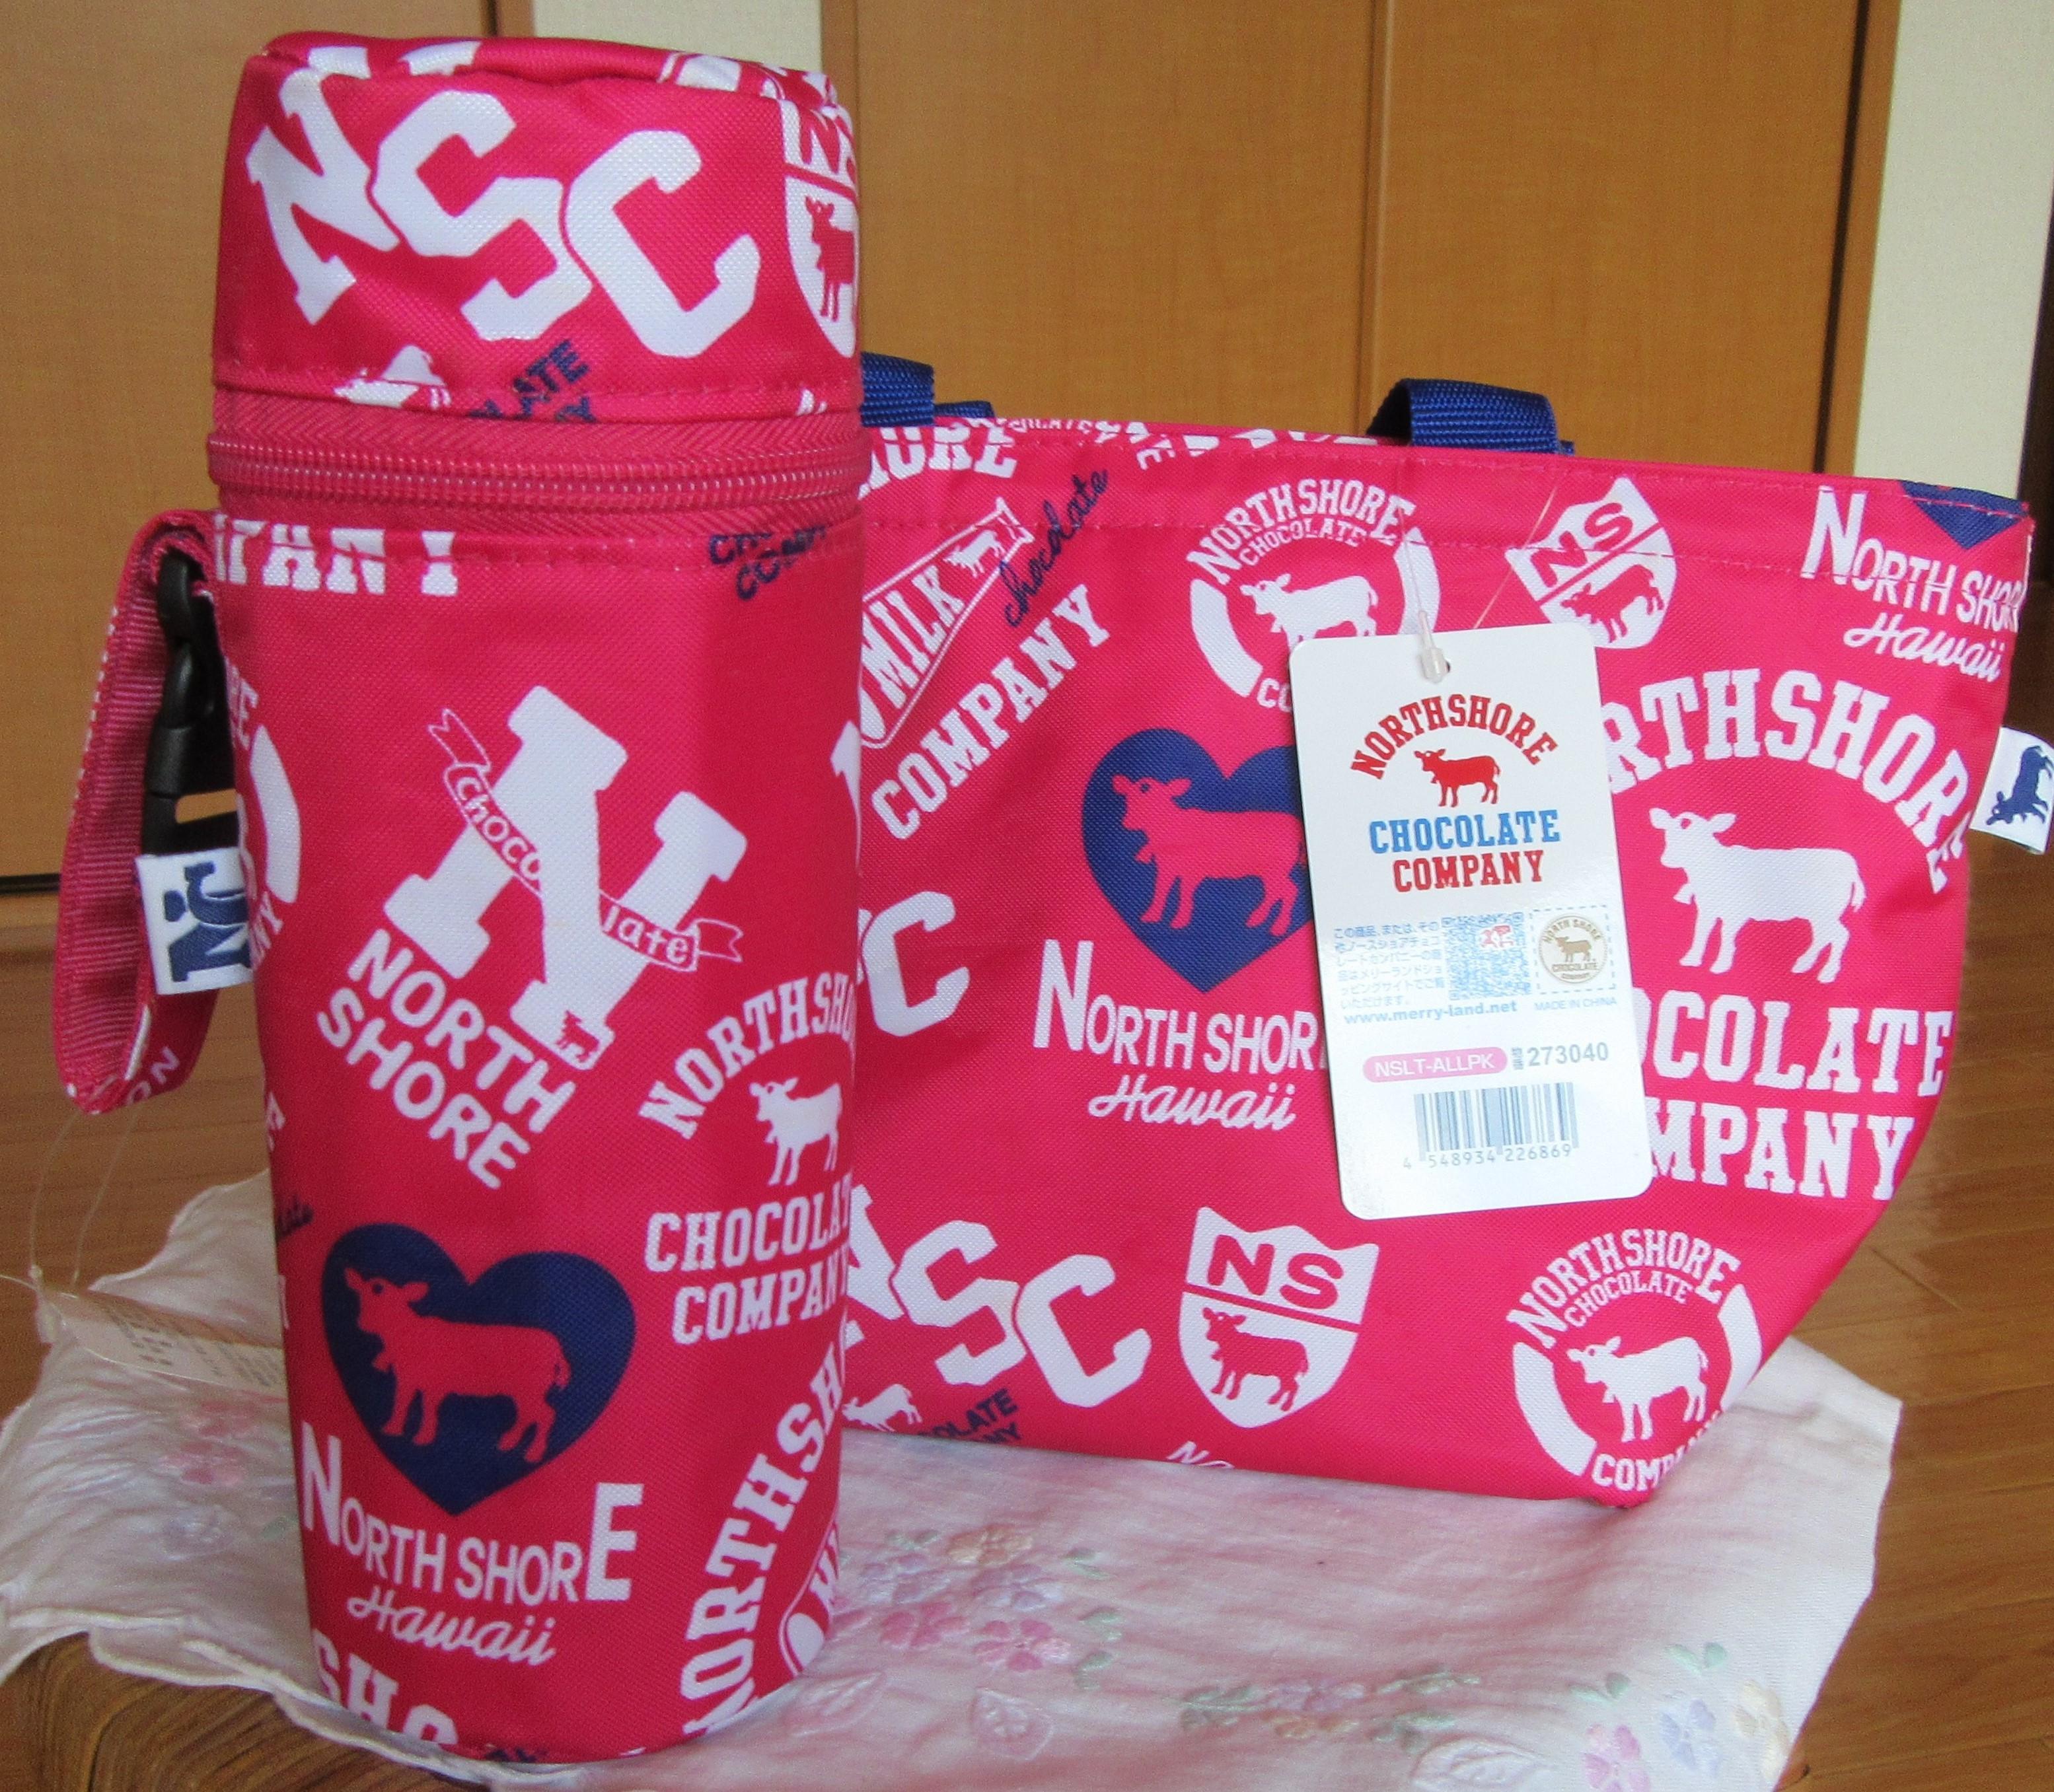 NSCC ノースショアチョコレートカンパニー ランチトートバッグ&ボトルカバーセット 新品